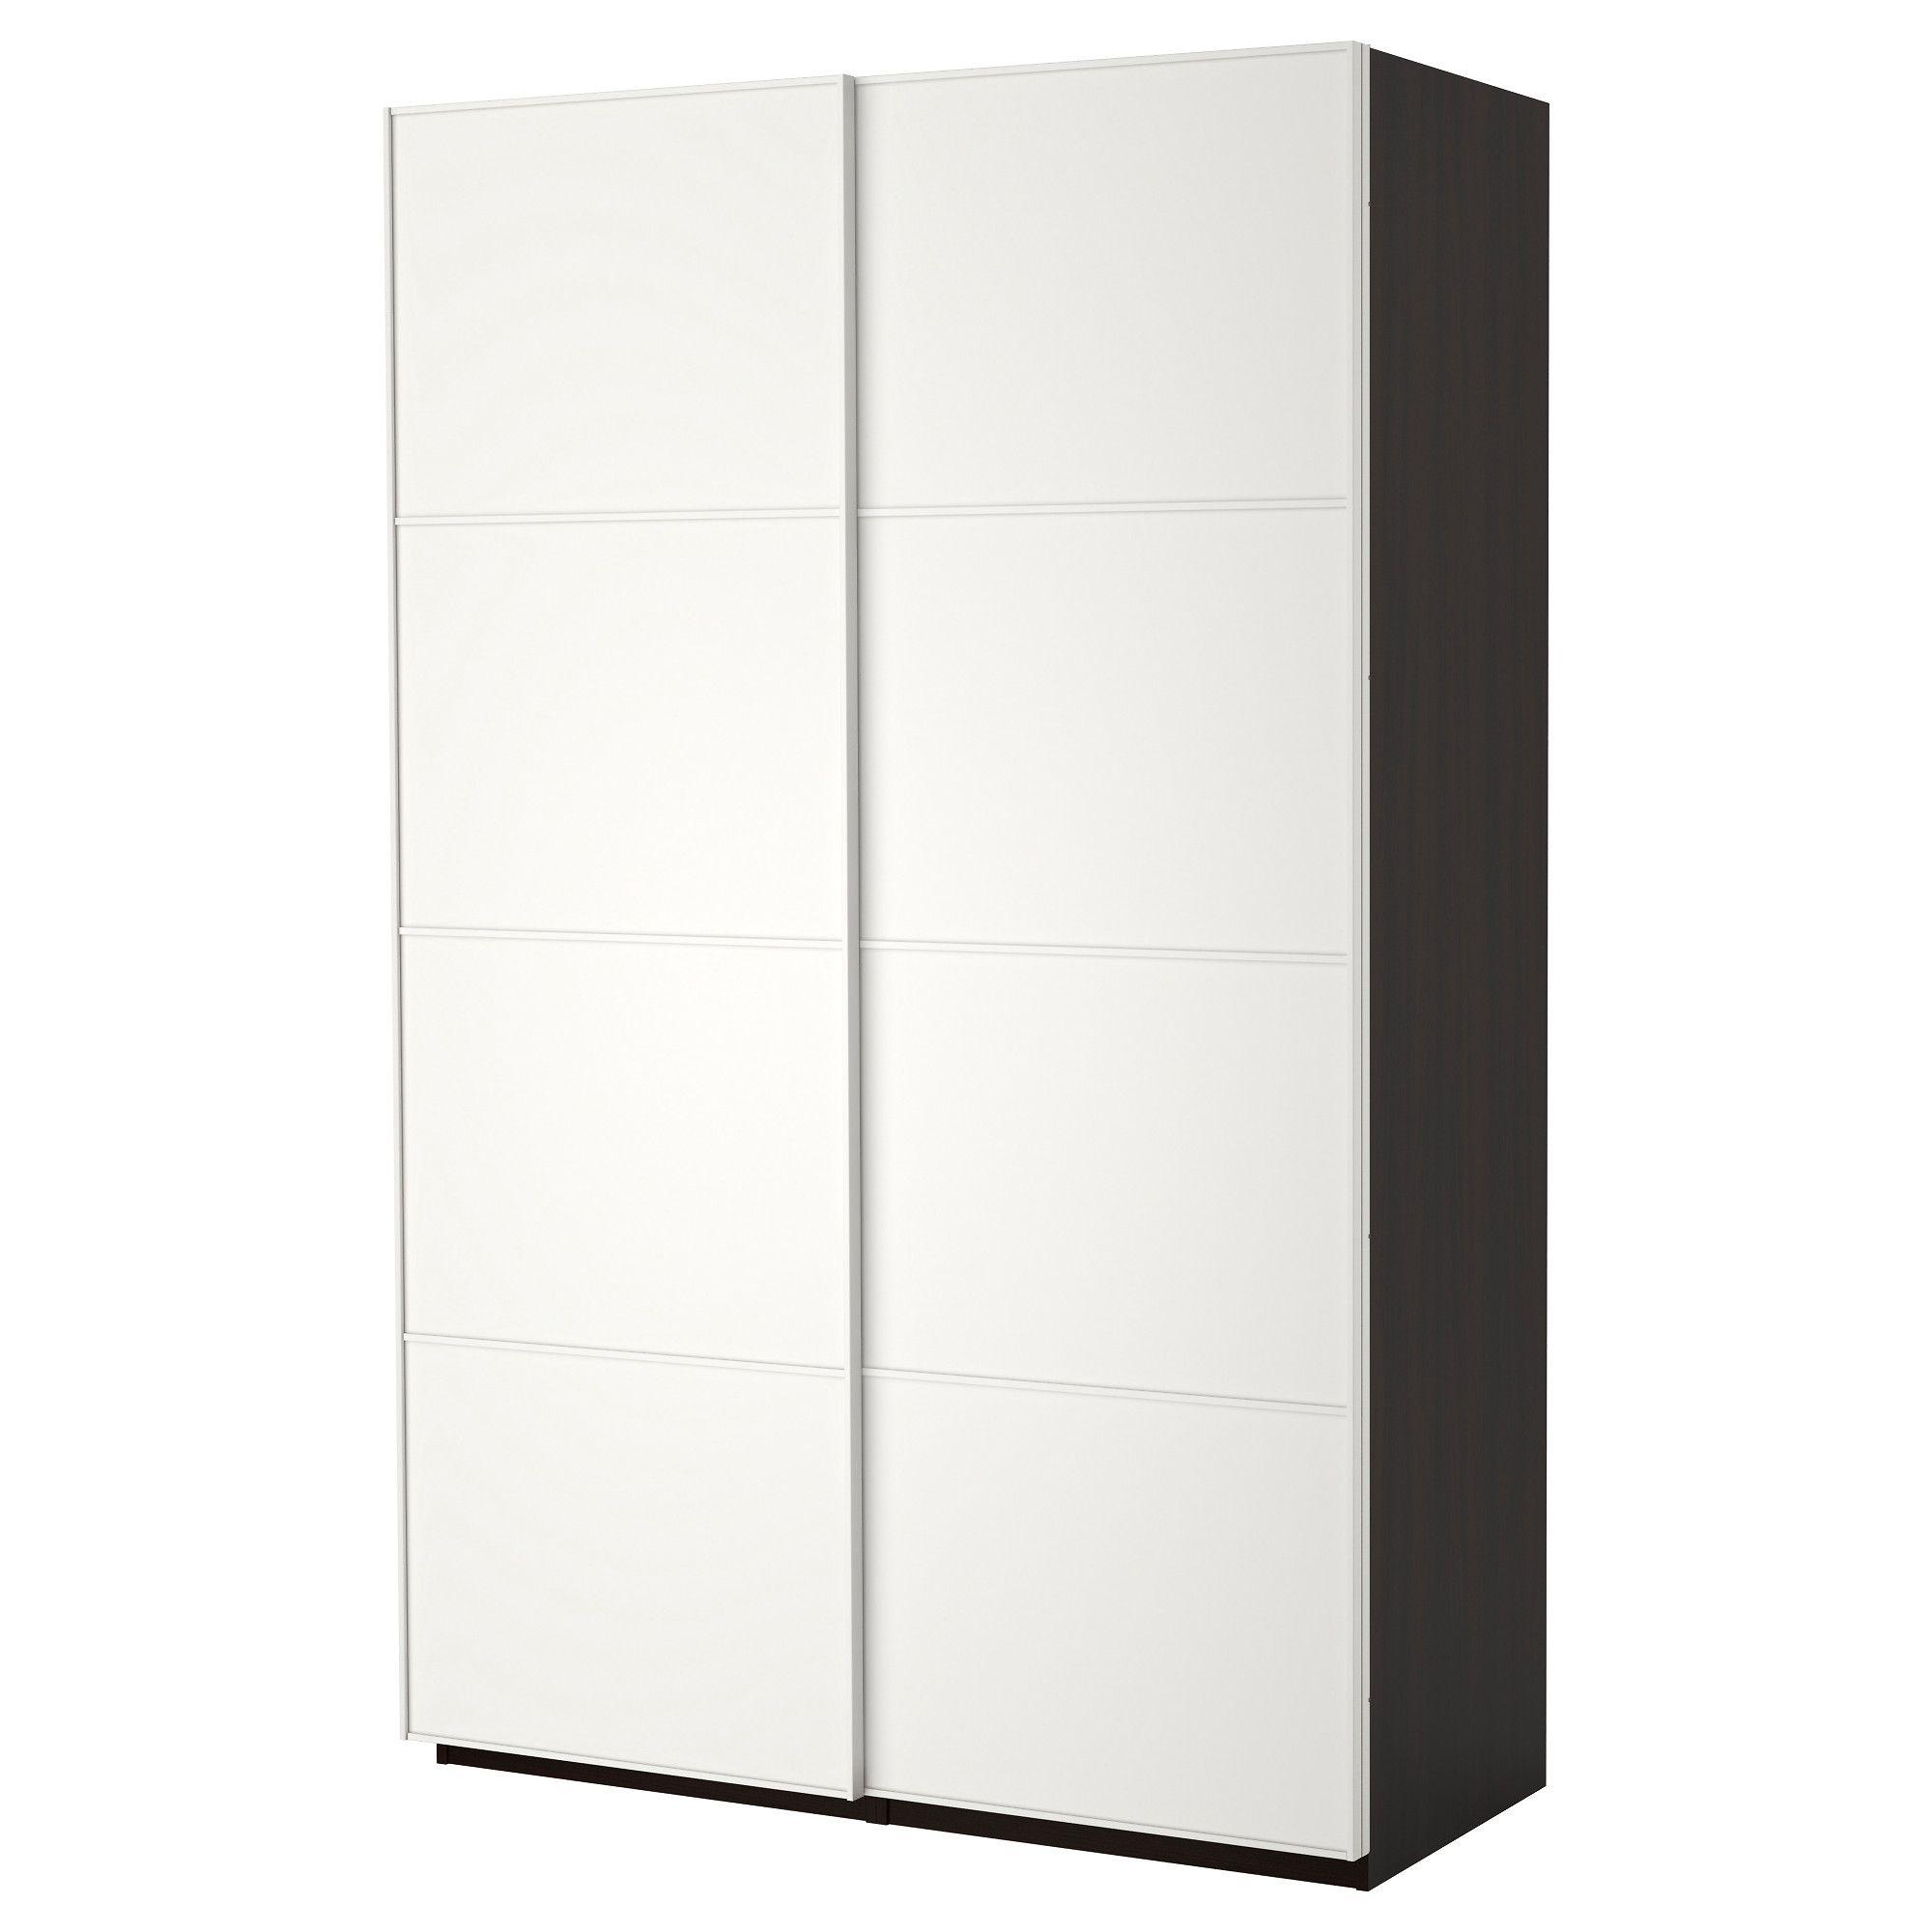 Furniture Home Furnishings Find Your Inspiration Ikea Pax Ikea Pax Wardrobe Pax Wardrobe